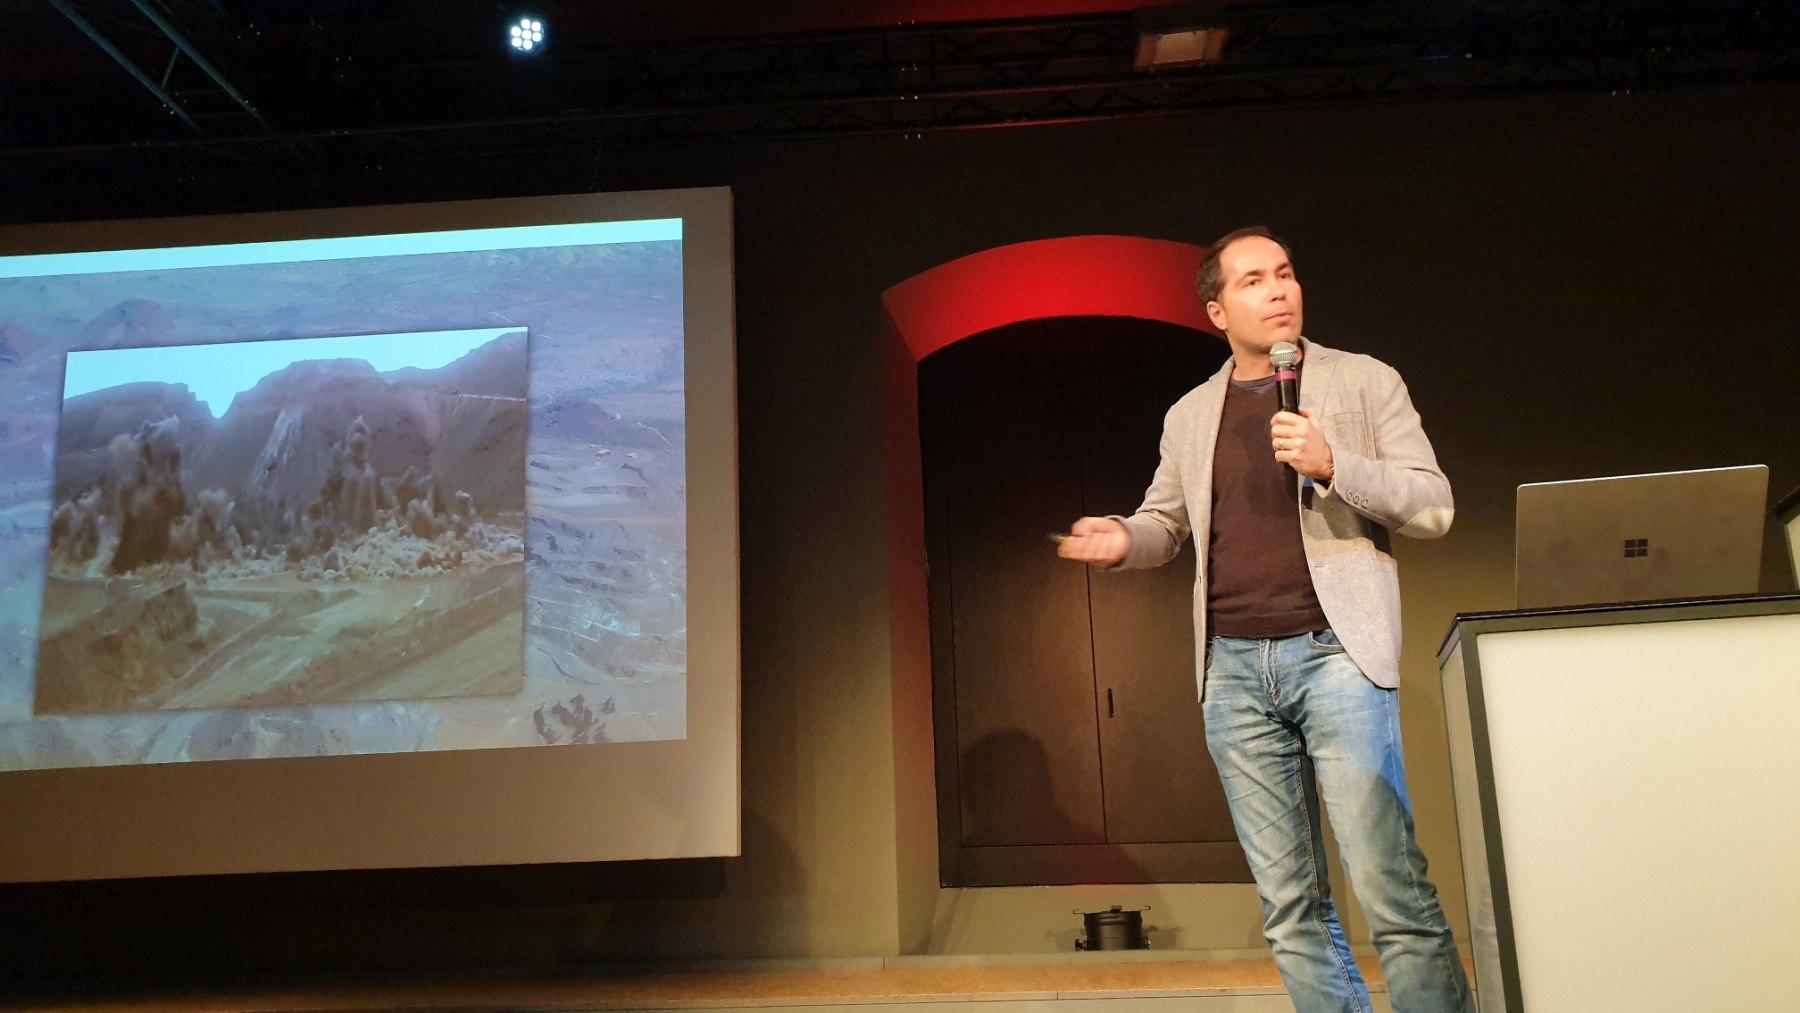 2019-12-09_Sprengseminar_Tirol_29